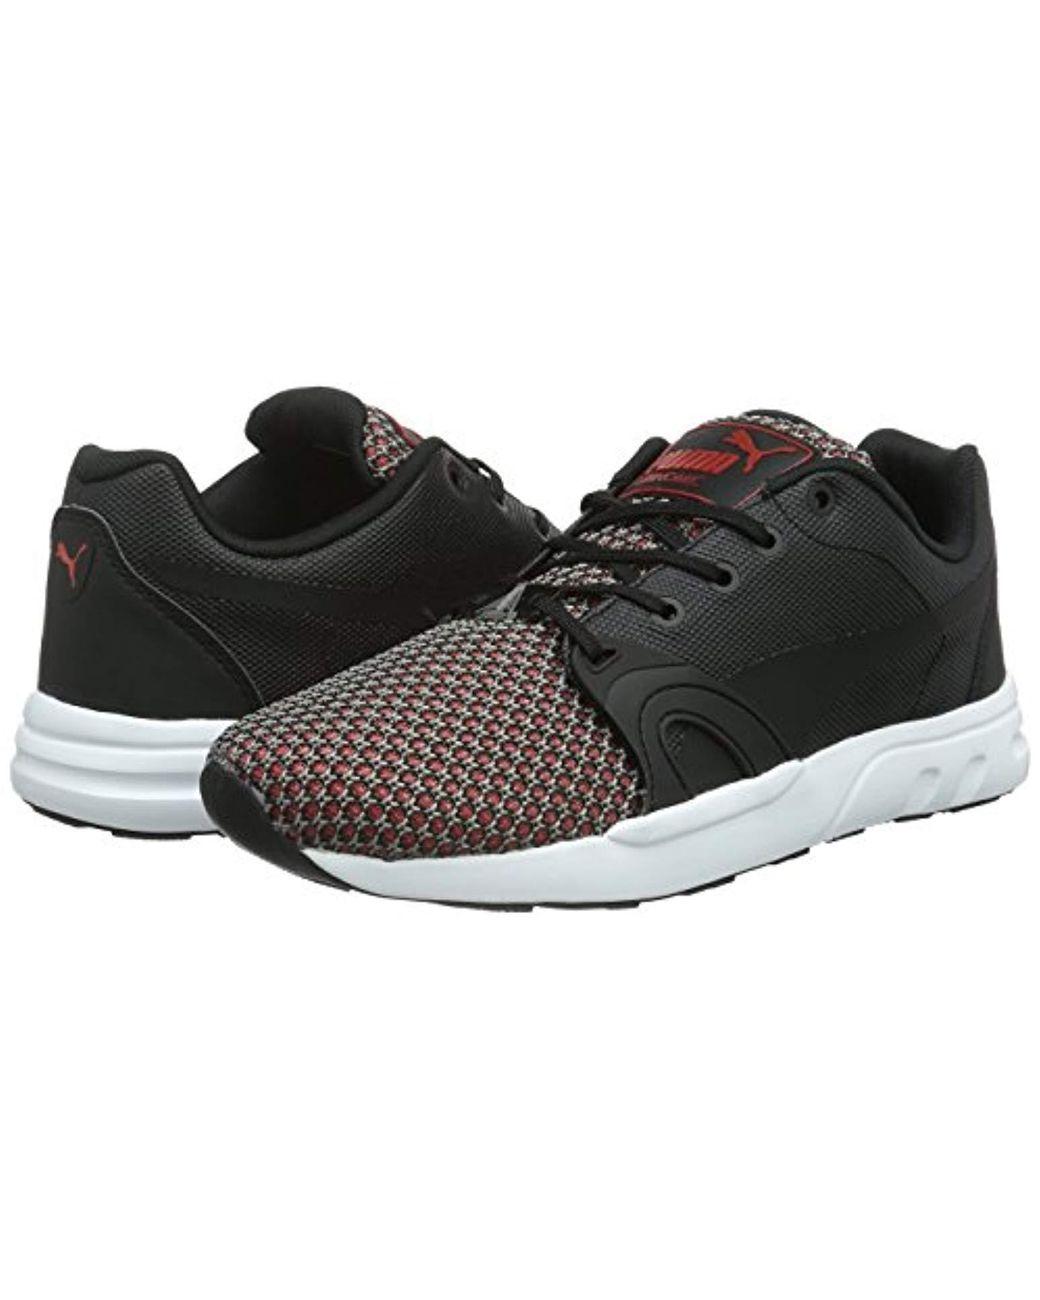 Men Low For In Sneakers Lyst Top Puma S Xt Black Filtered's rdCBexo